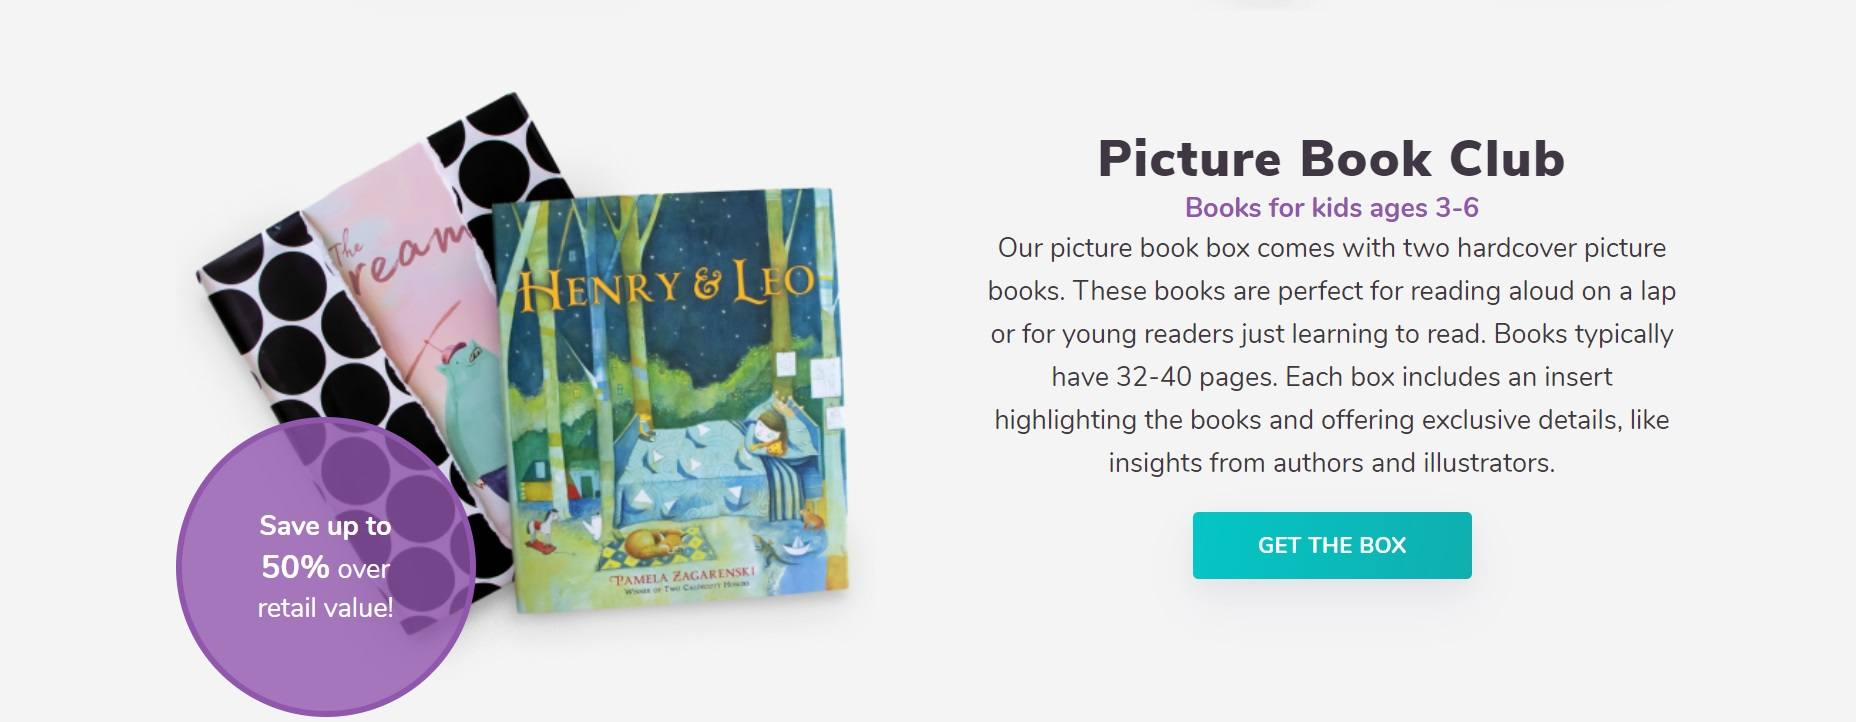 Bookroo Picture Book Club